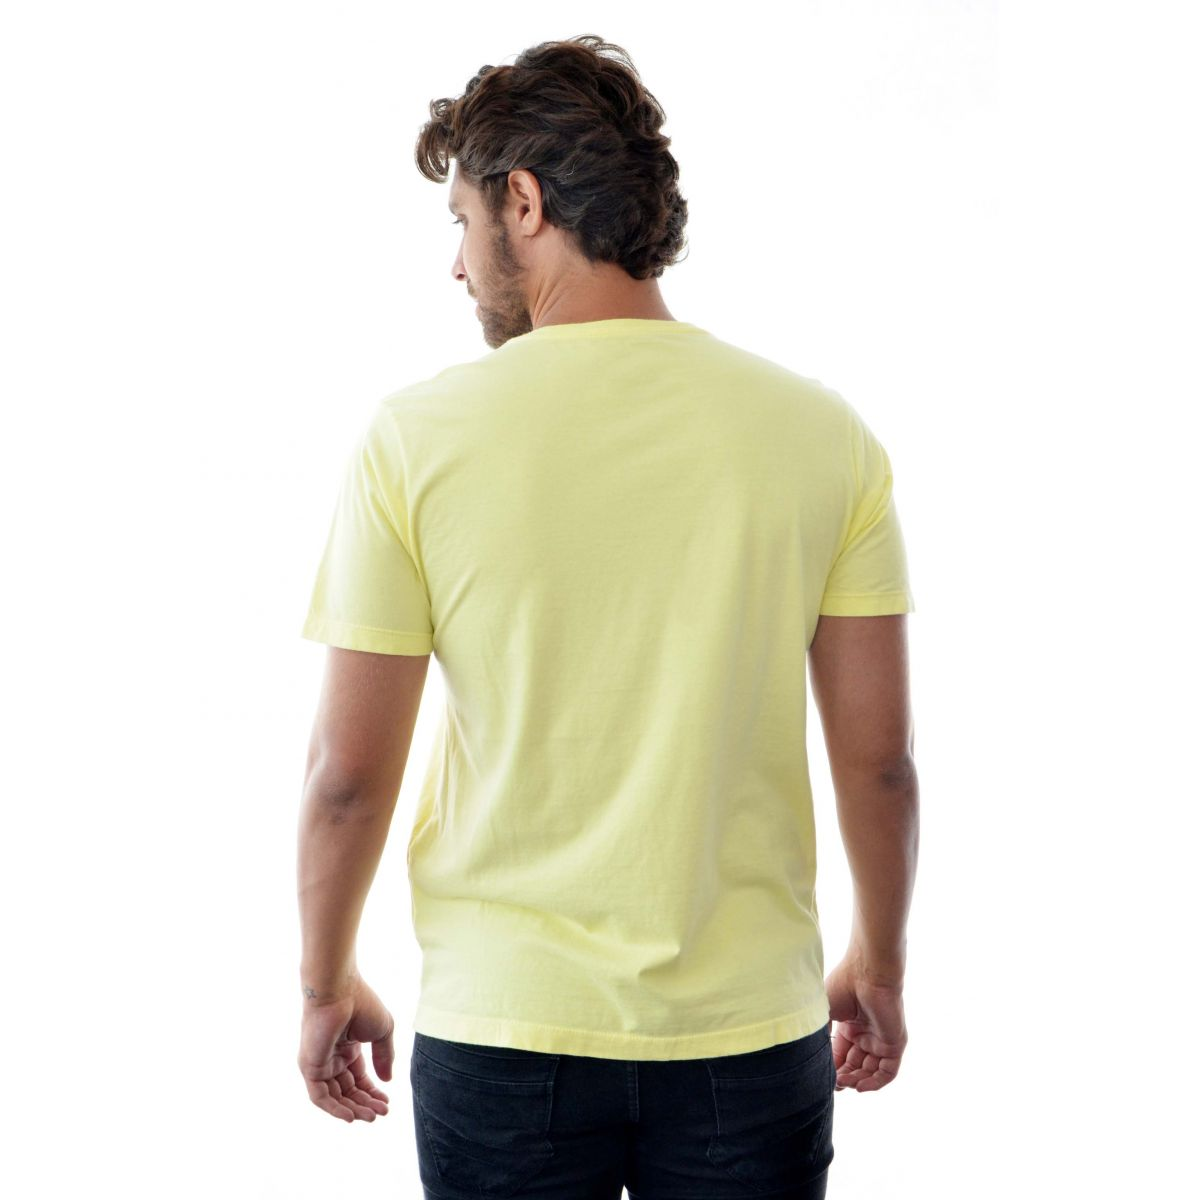 Camiseta Basic TH Amarela  - Ca Brasileira